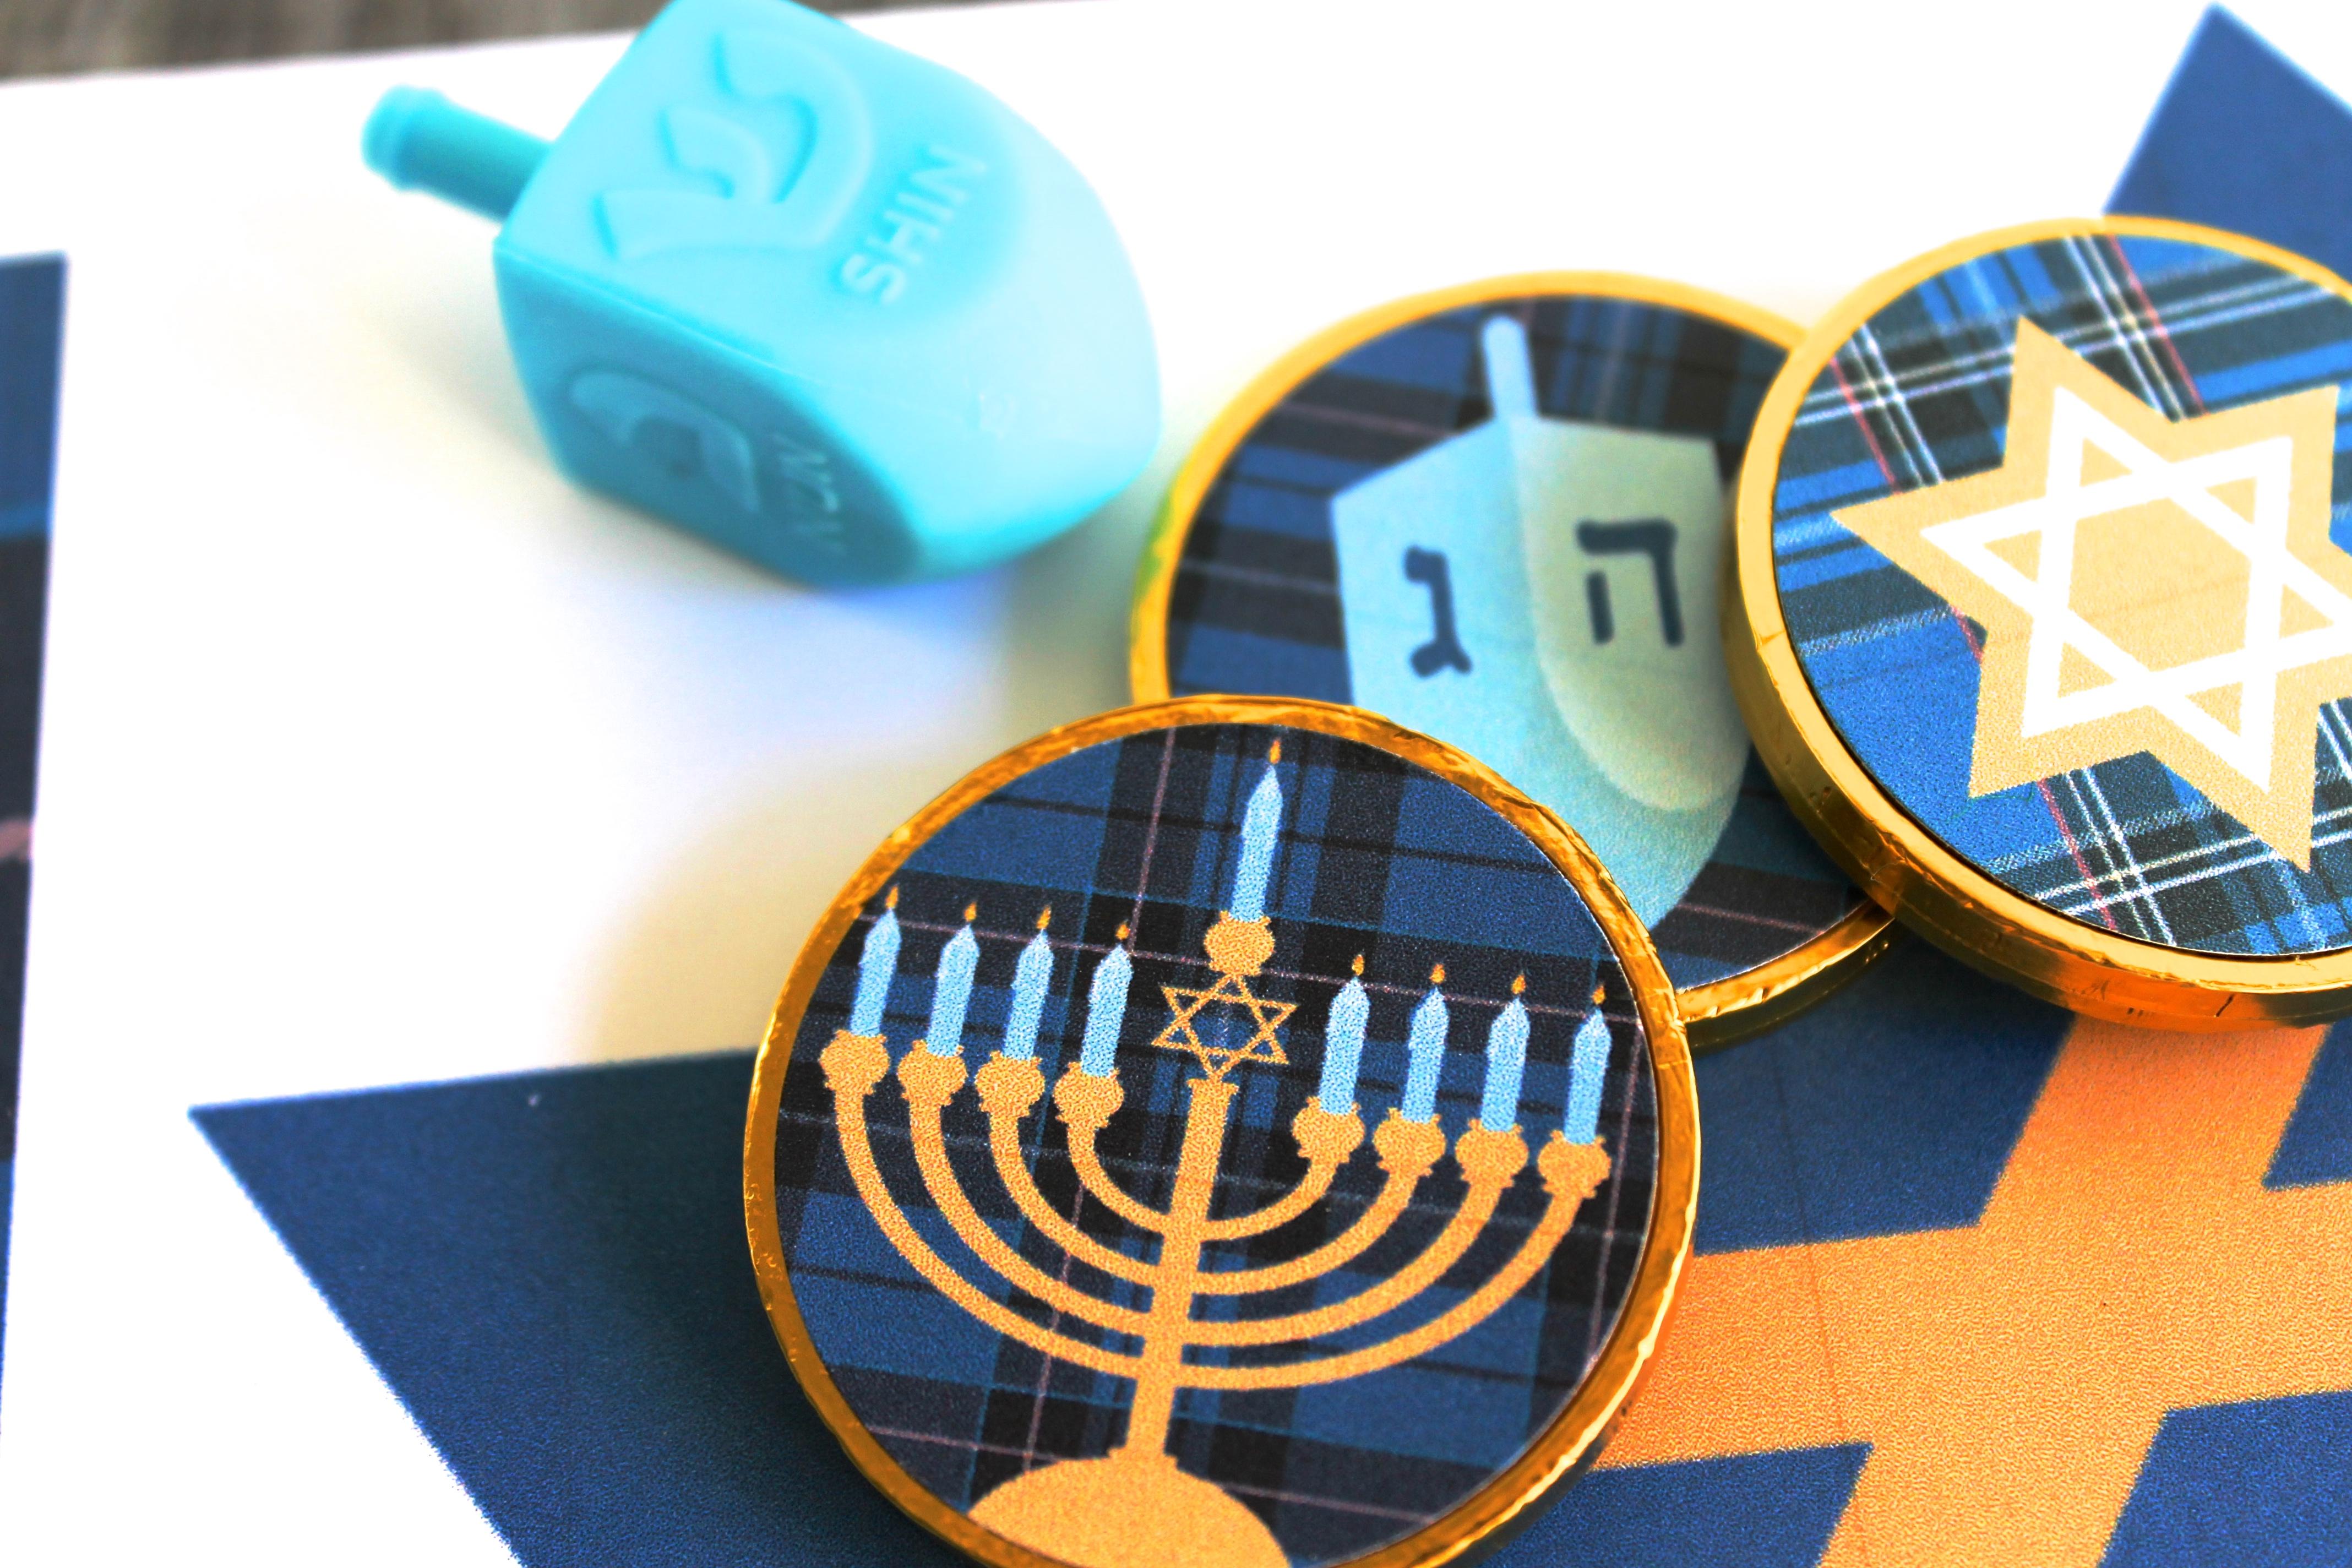 Hanukkah Dreidel Game - Everyday Party Magazine